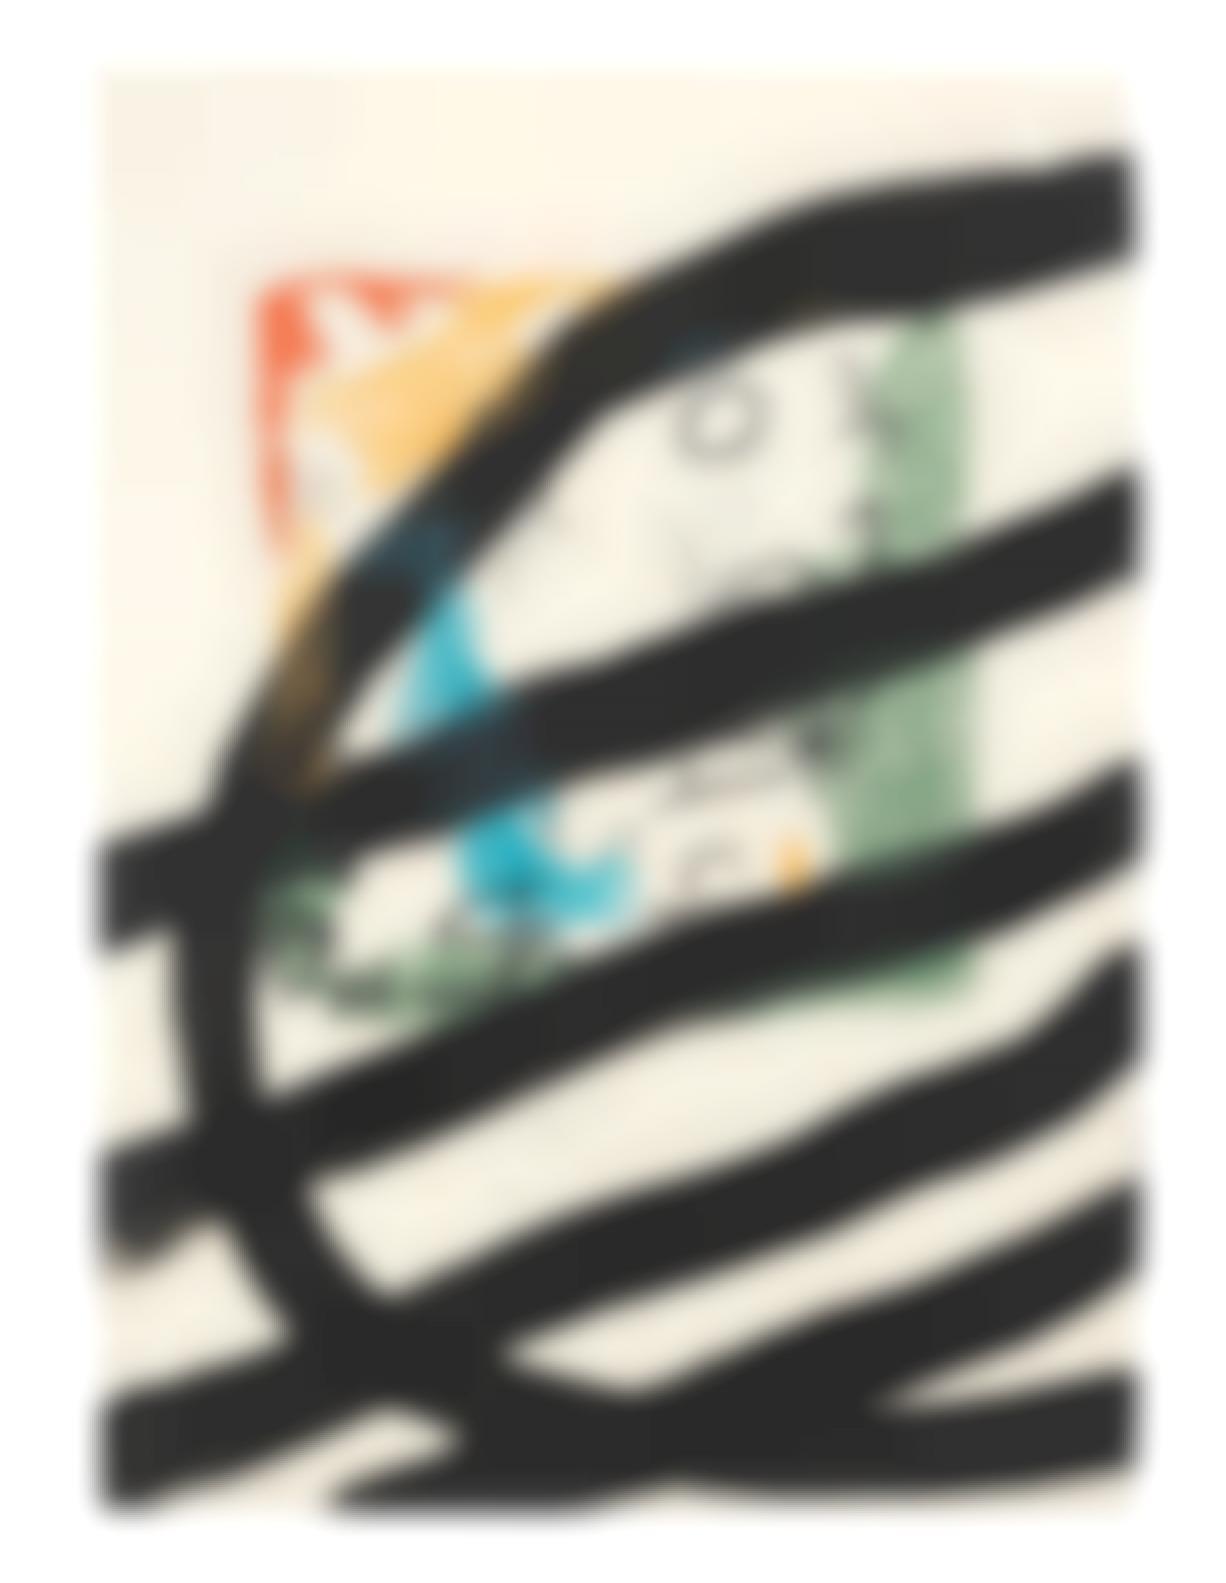 Joan Miro-One Plate, From Les Essencies De La Terra (Mourlot 574; Cramer Books 123)-1968